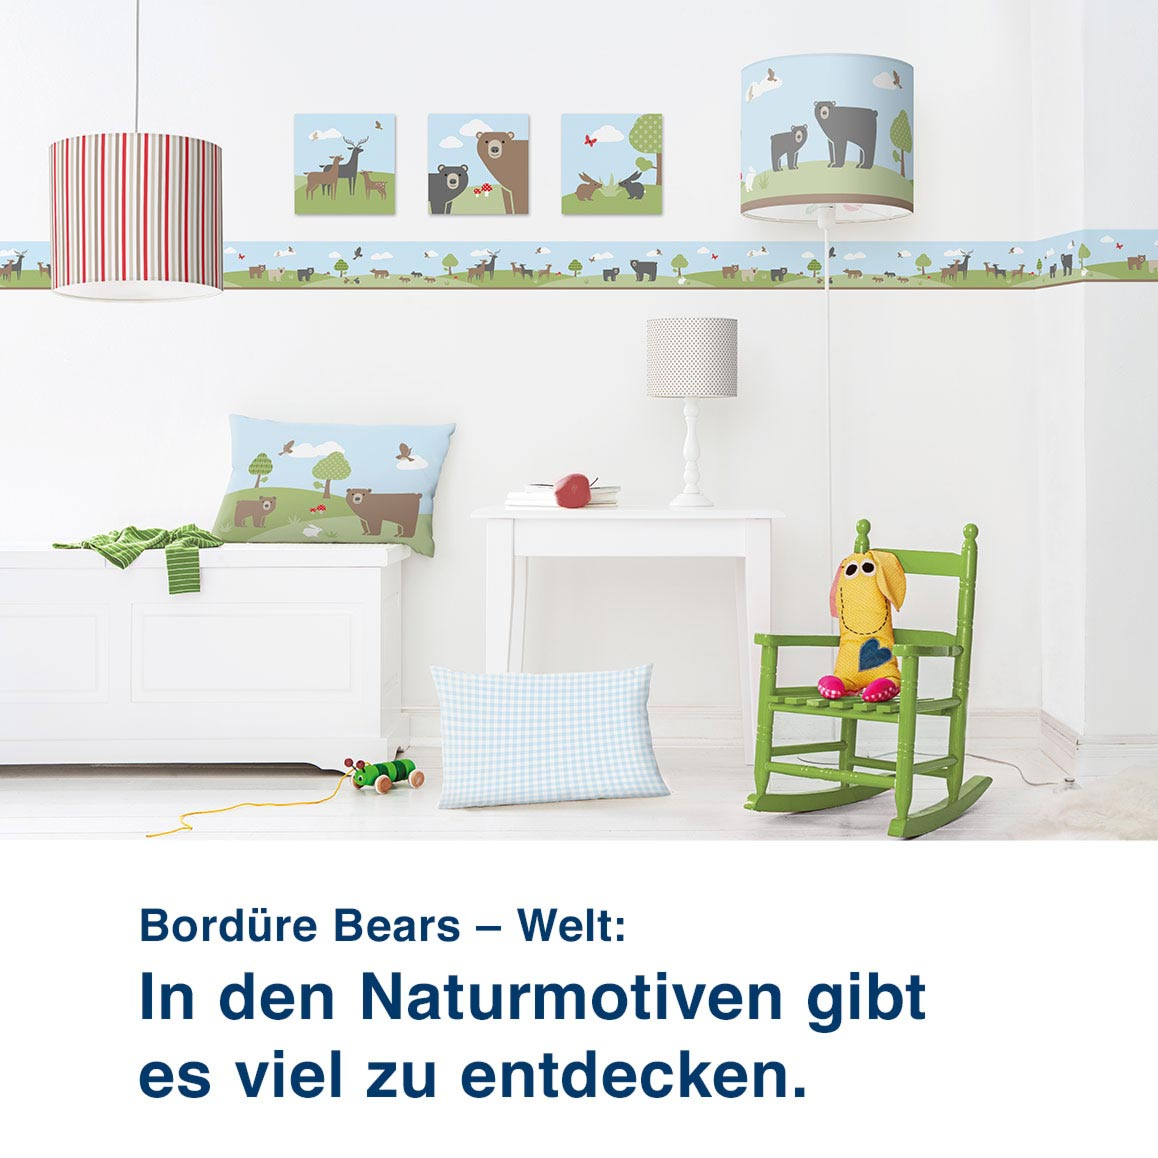 Bordüre Bears – Welt:  In den Naturmotiven gibt  es viel zu entdecken.